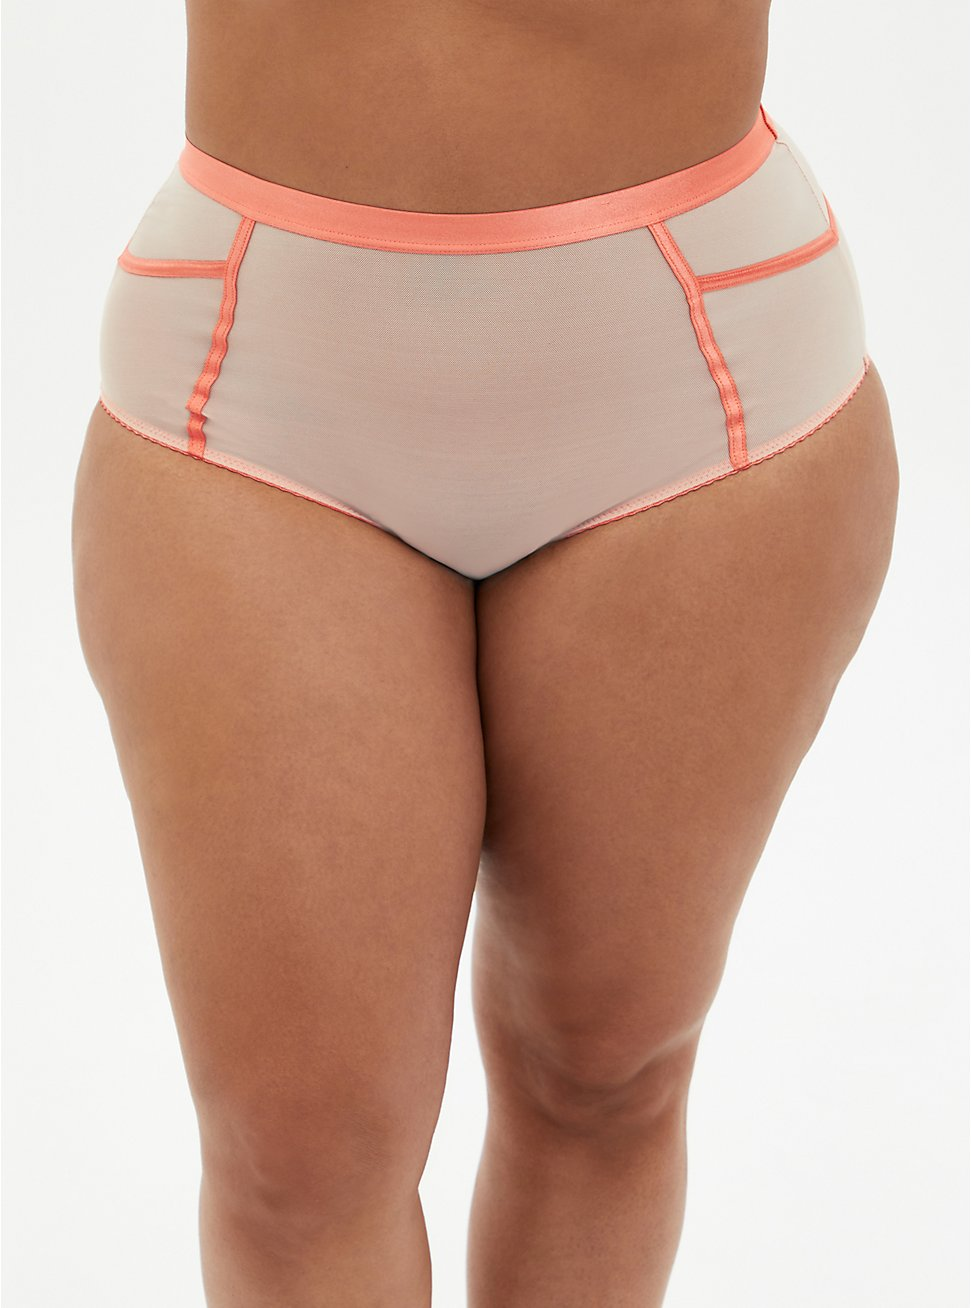 Plus Size Dusty Coral Mesh High Waist Panty, DESERT FLORAL, hi-res